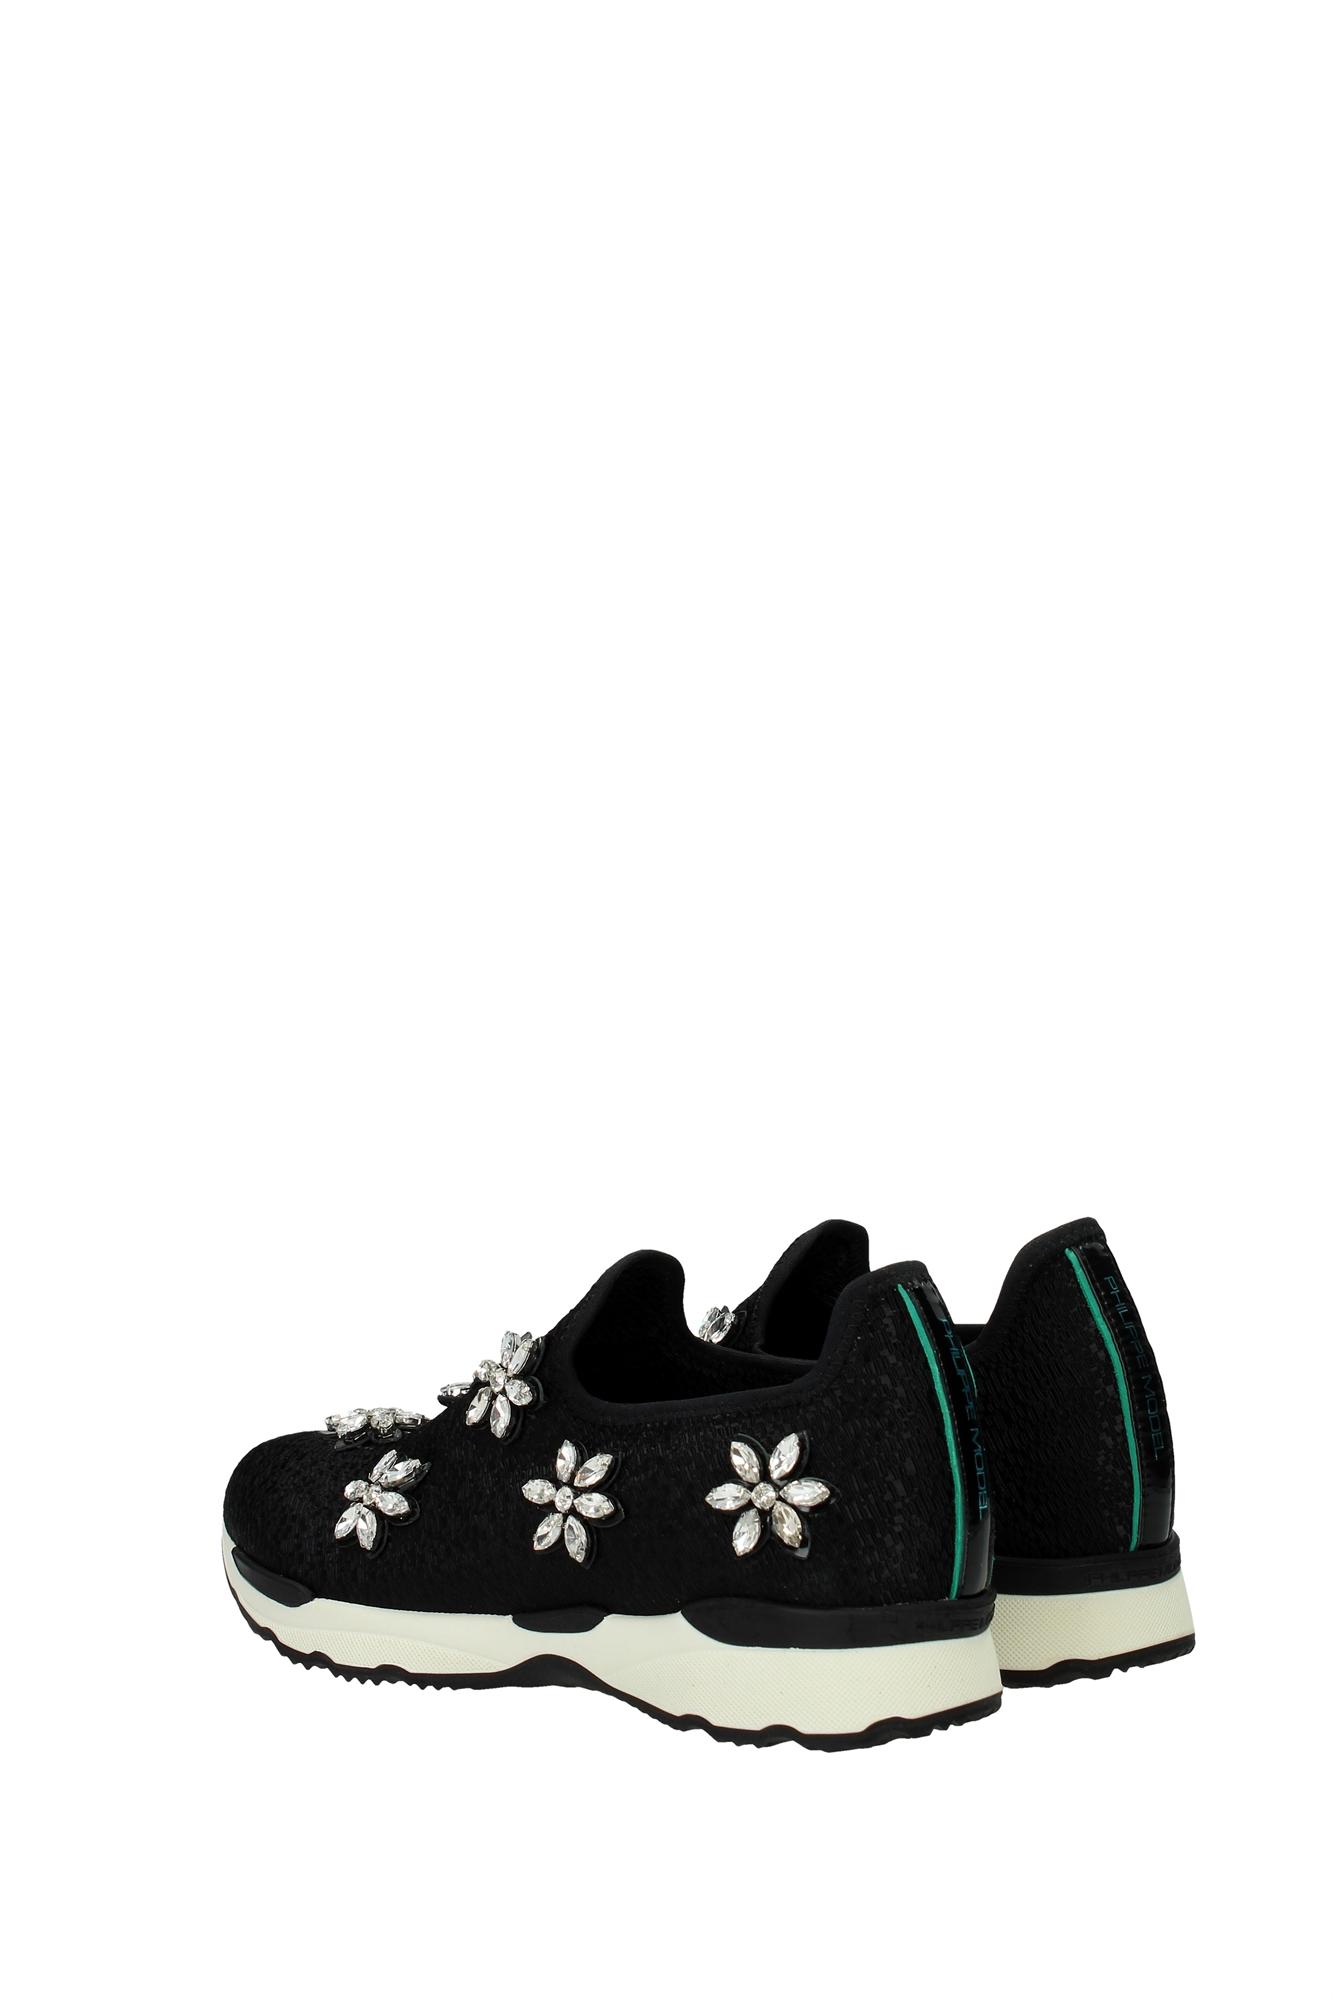 sneakers philippe model damen stoff schwarz ptldex03 ebay. Black Bedroom Furniture Sets. Home Design Ideas